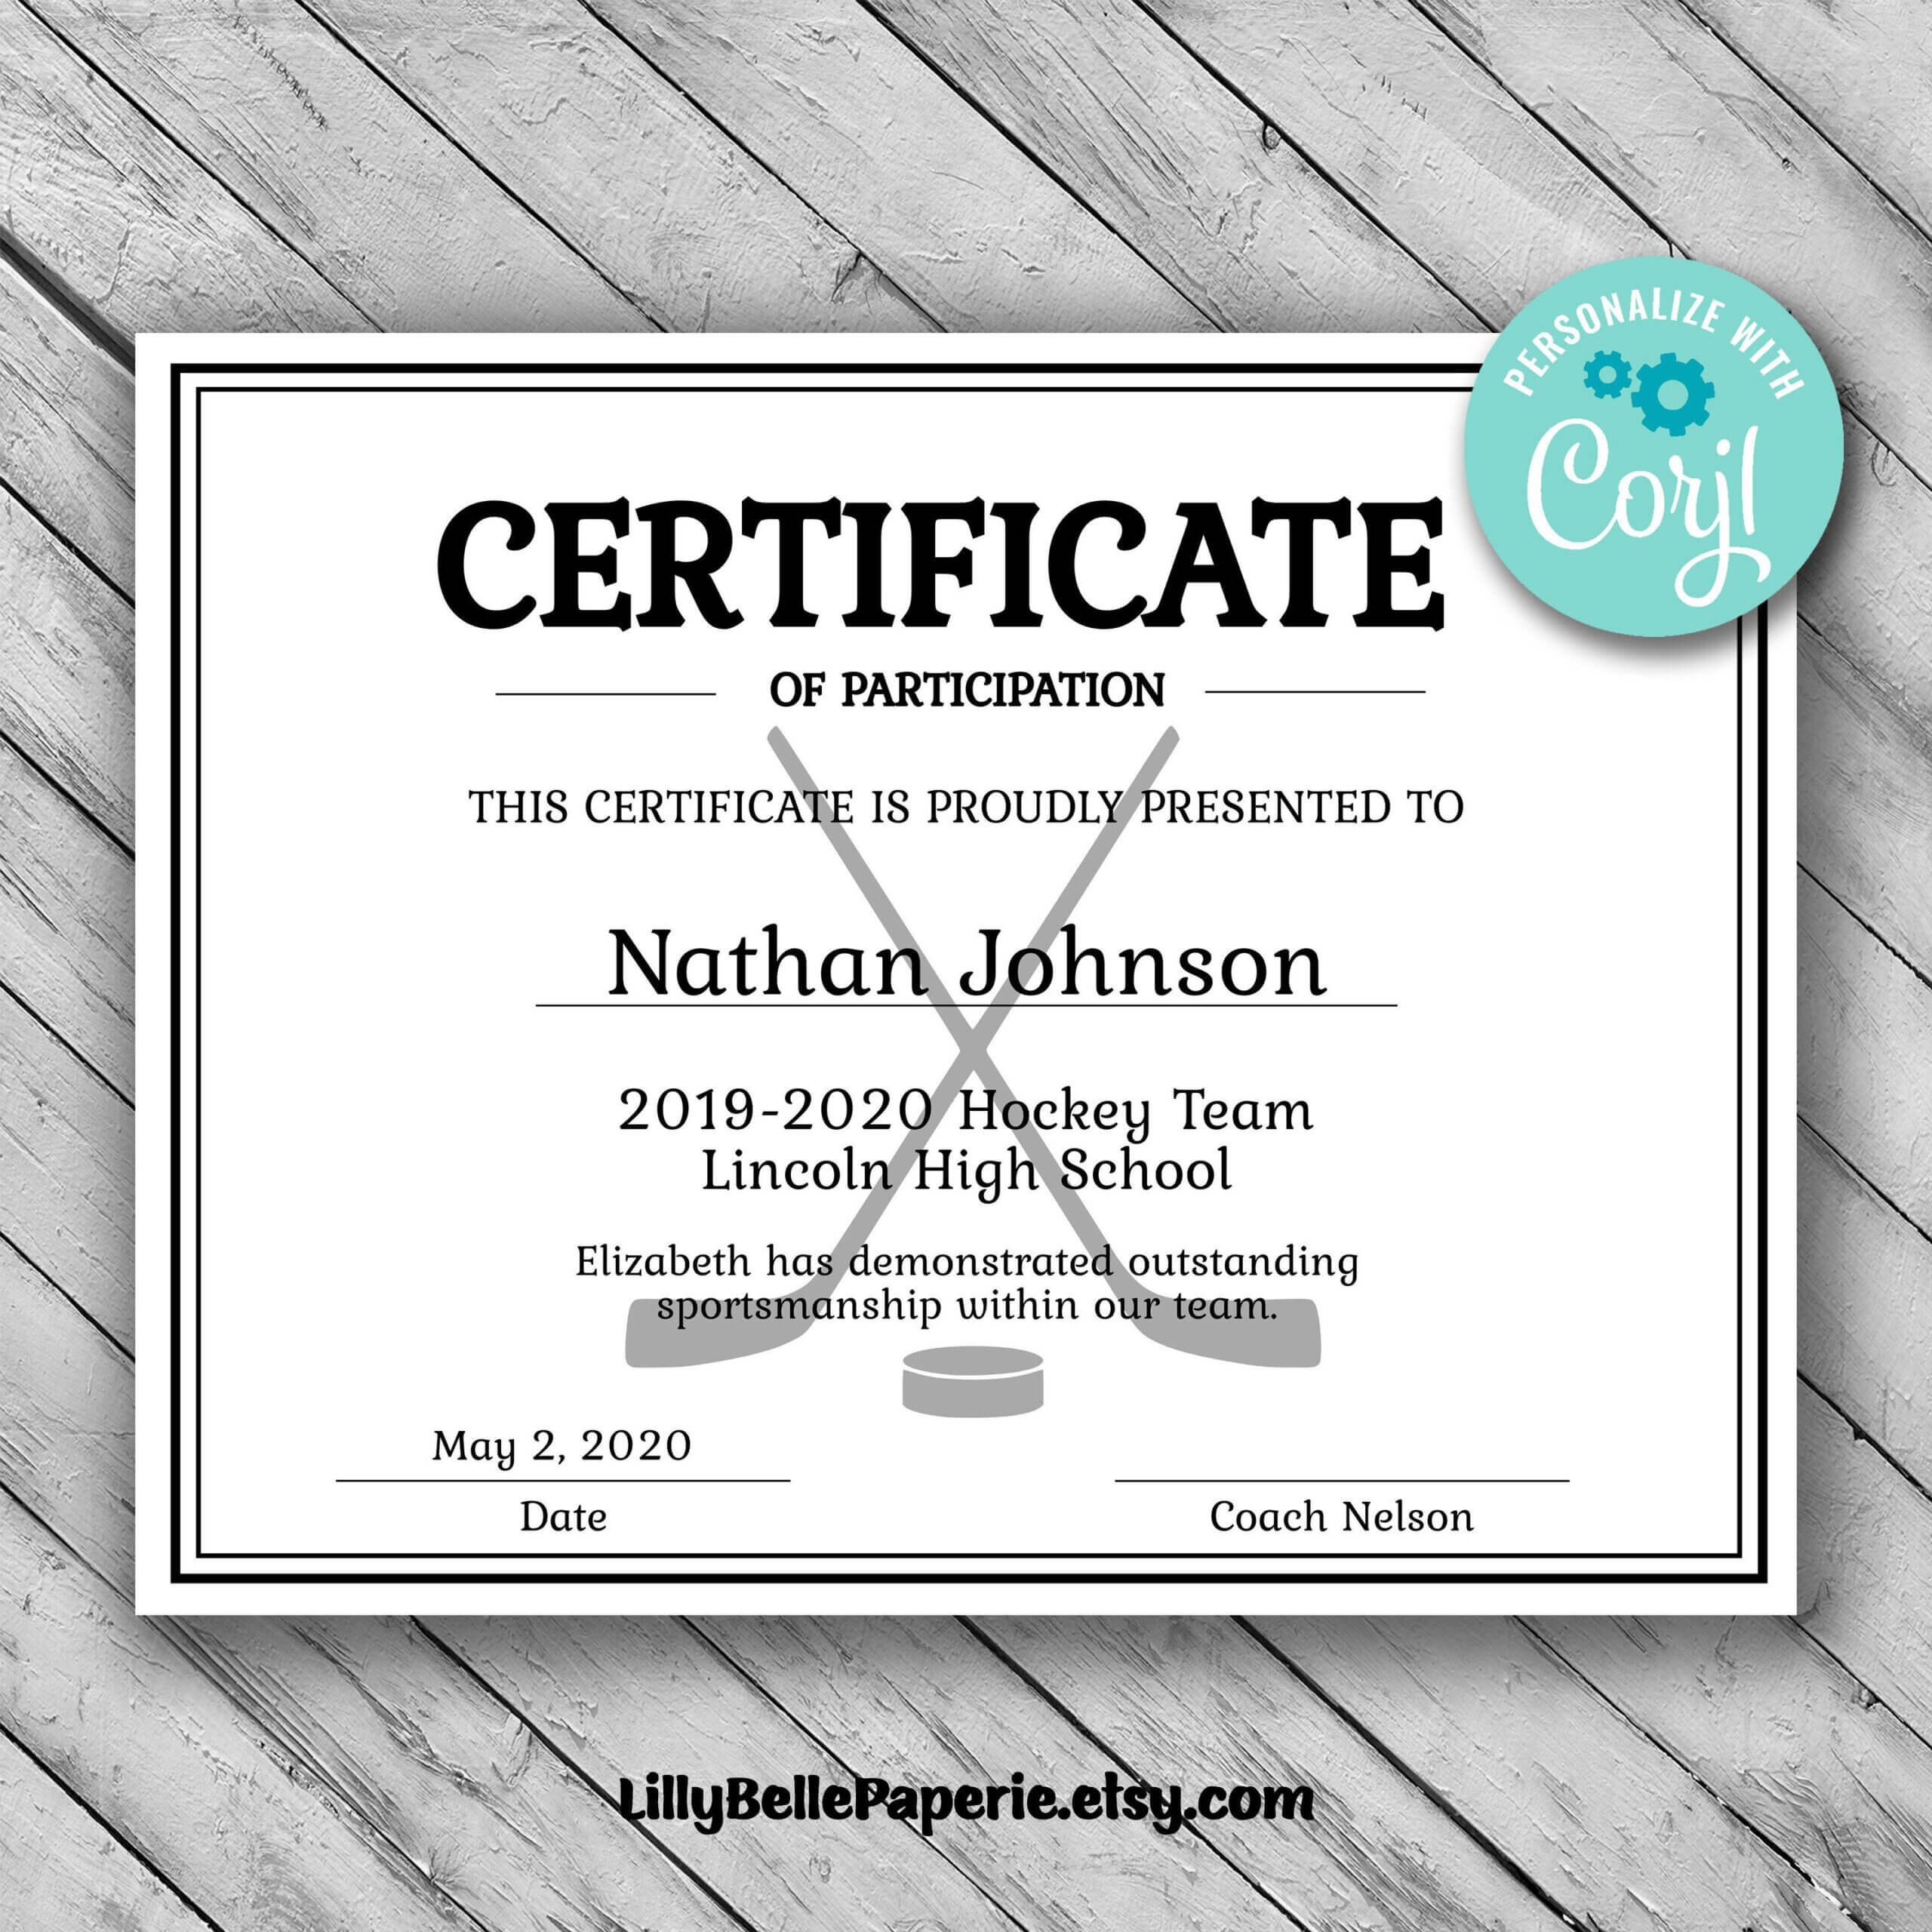 Editable Hockey Sports Team Certificate Template - Printable With Regard To Hockey Certificate Templates